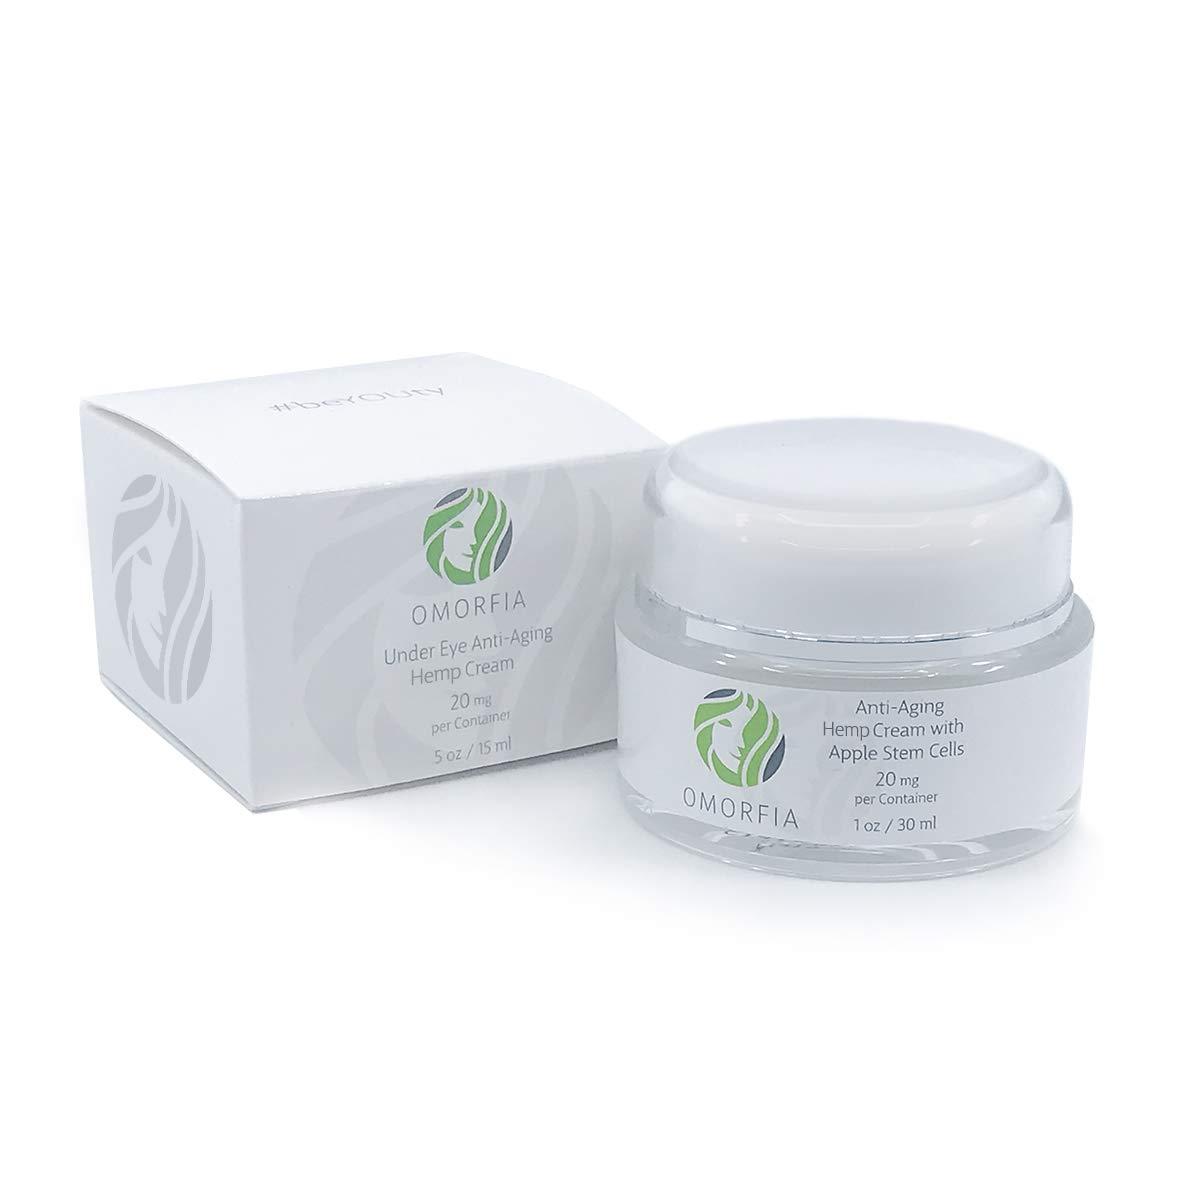 Omorfia Hemp Extract Anti-Aging Cream with Apple Stem Cells - 20mg 1oz